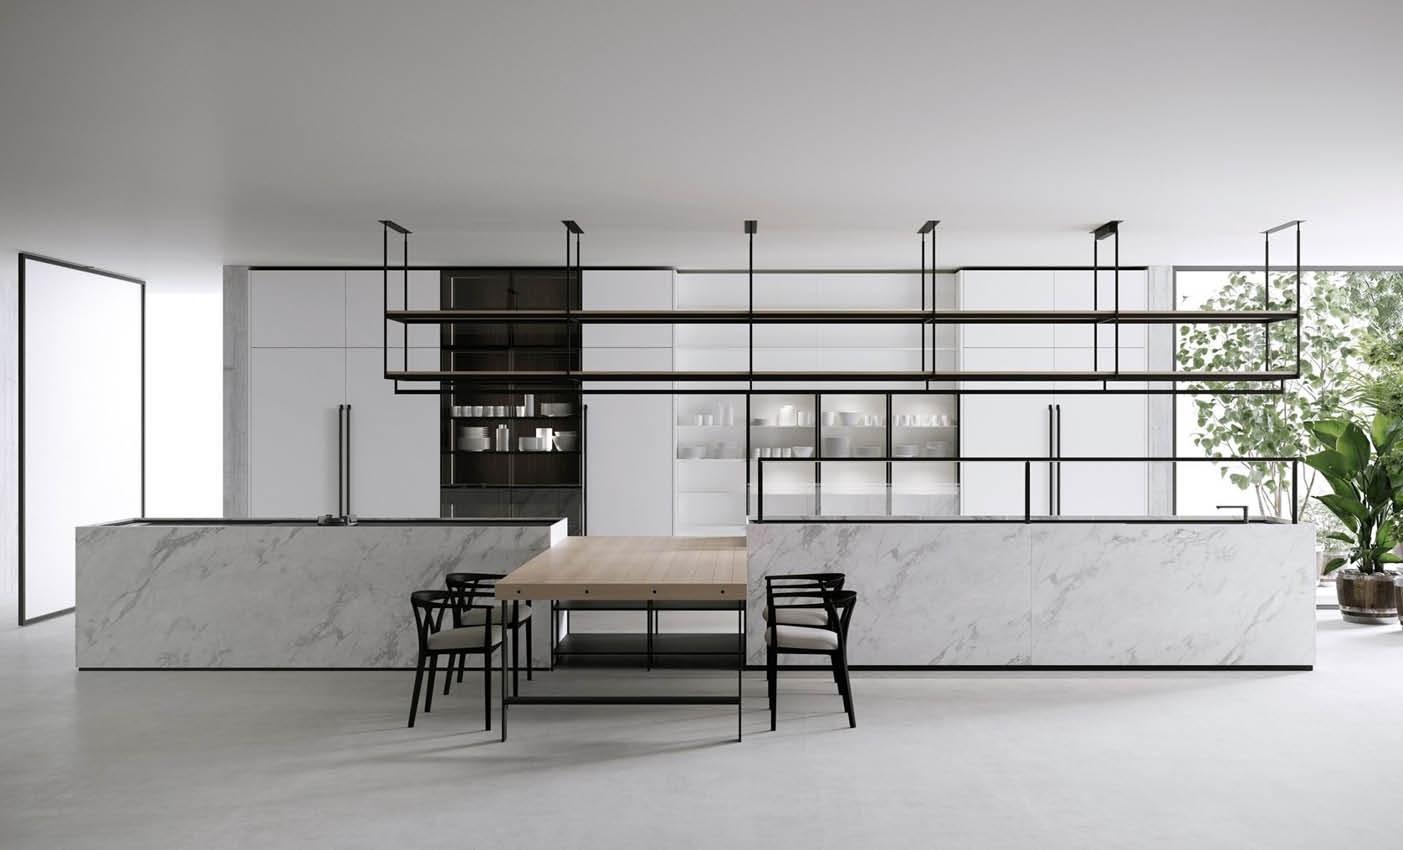 boffi combine kitchen presented during milan design week 2020